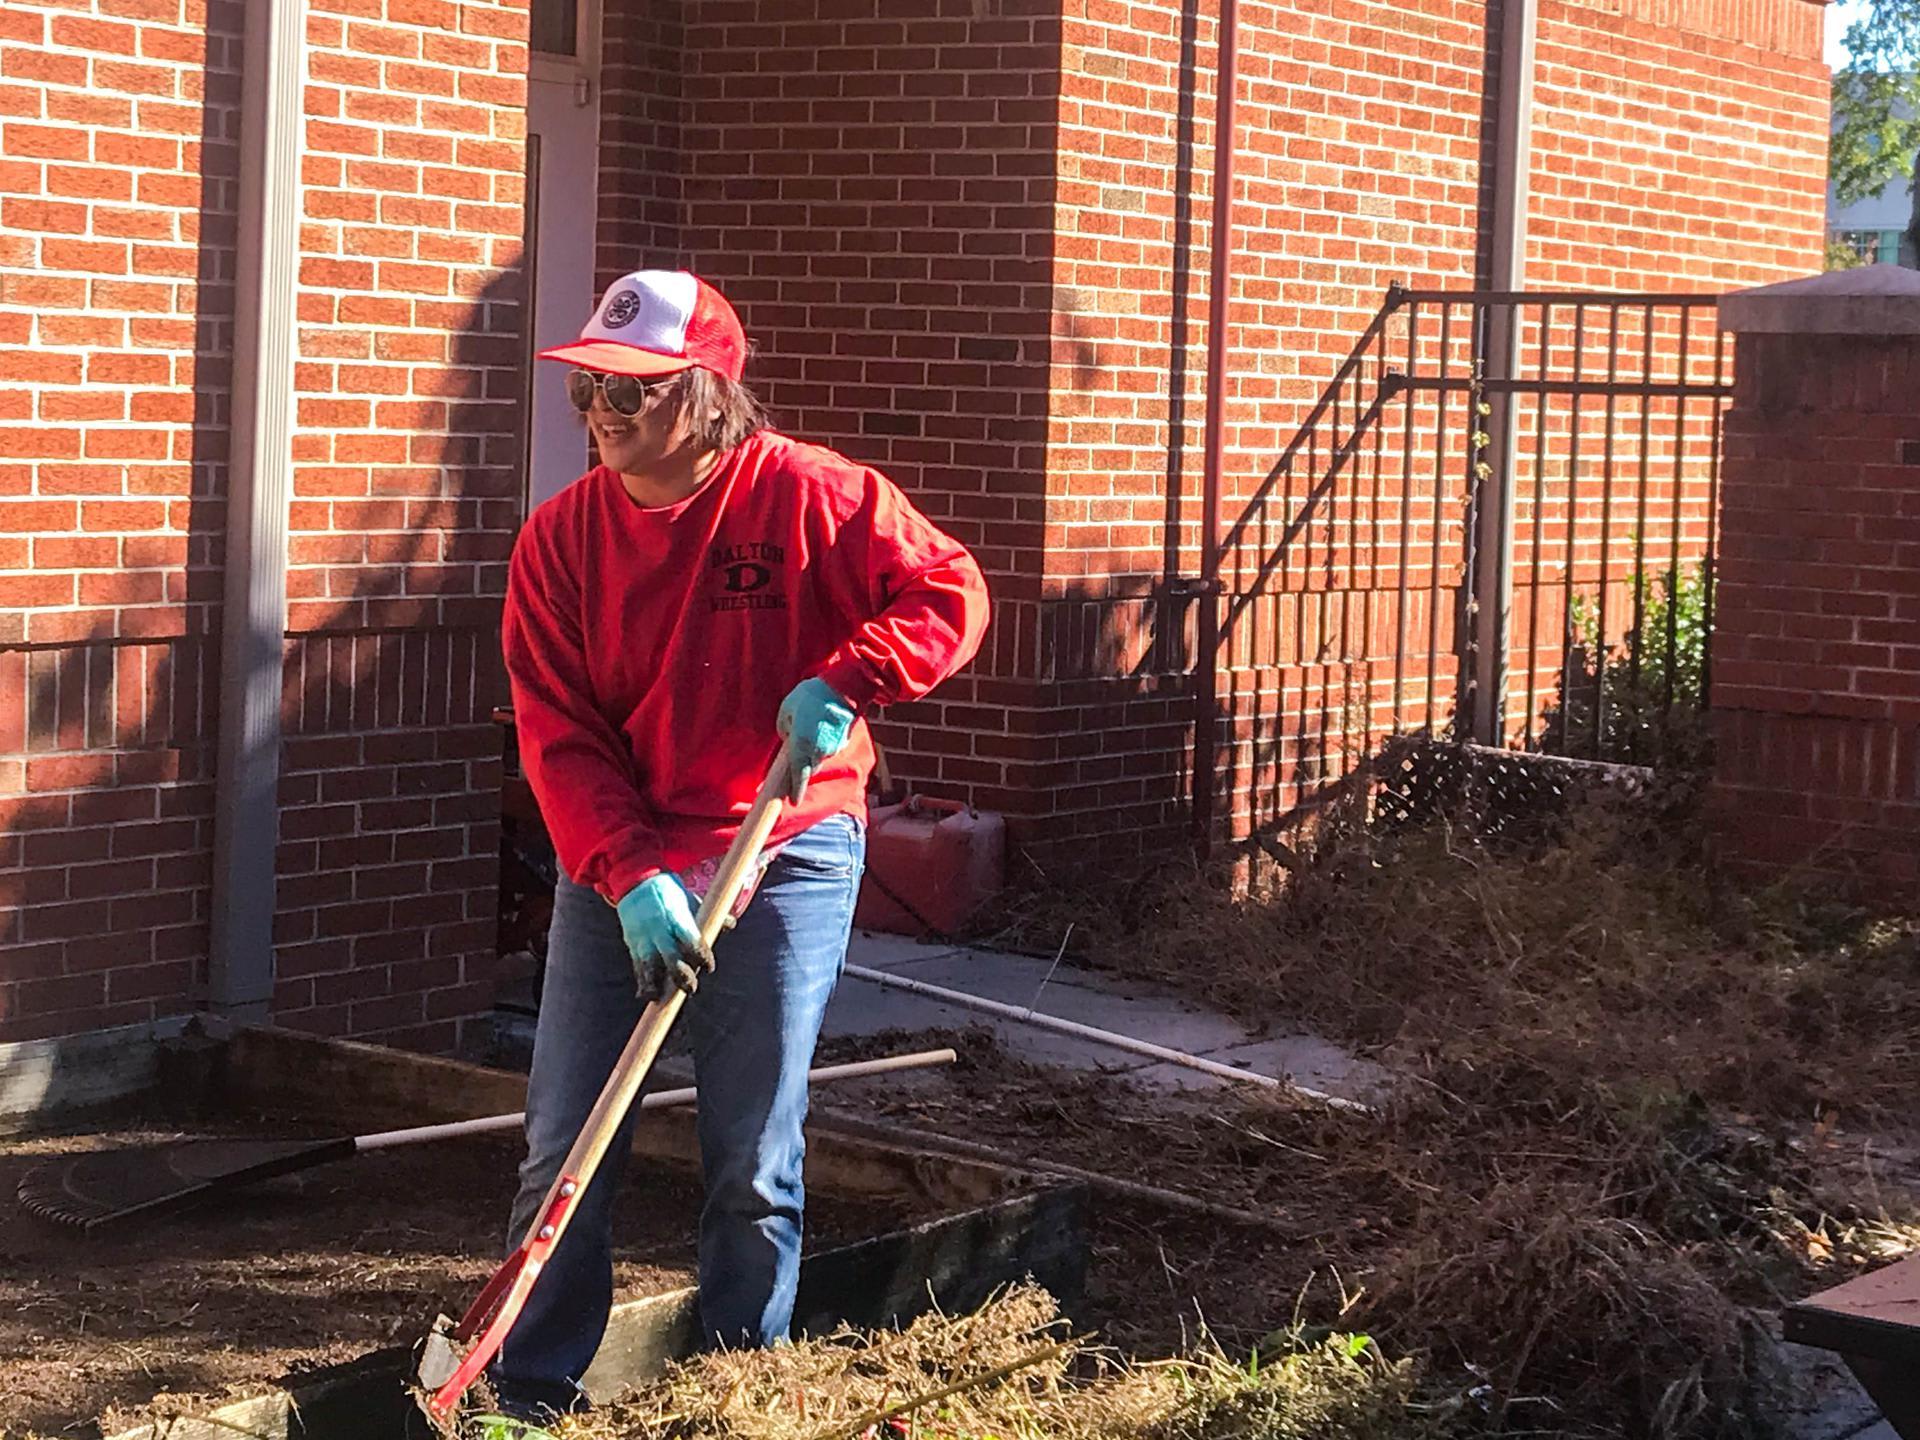 City Park staff member raking leaves